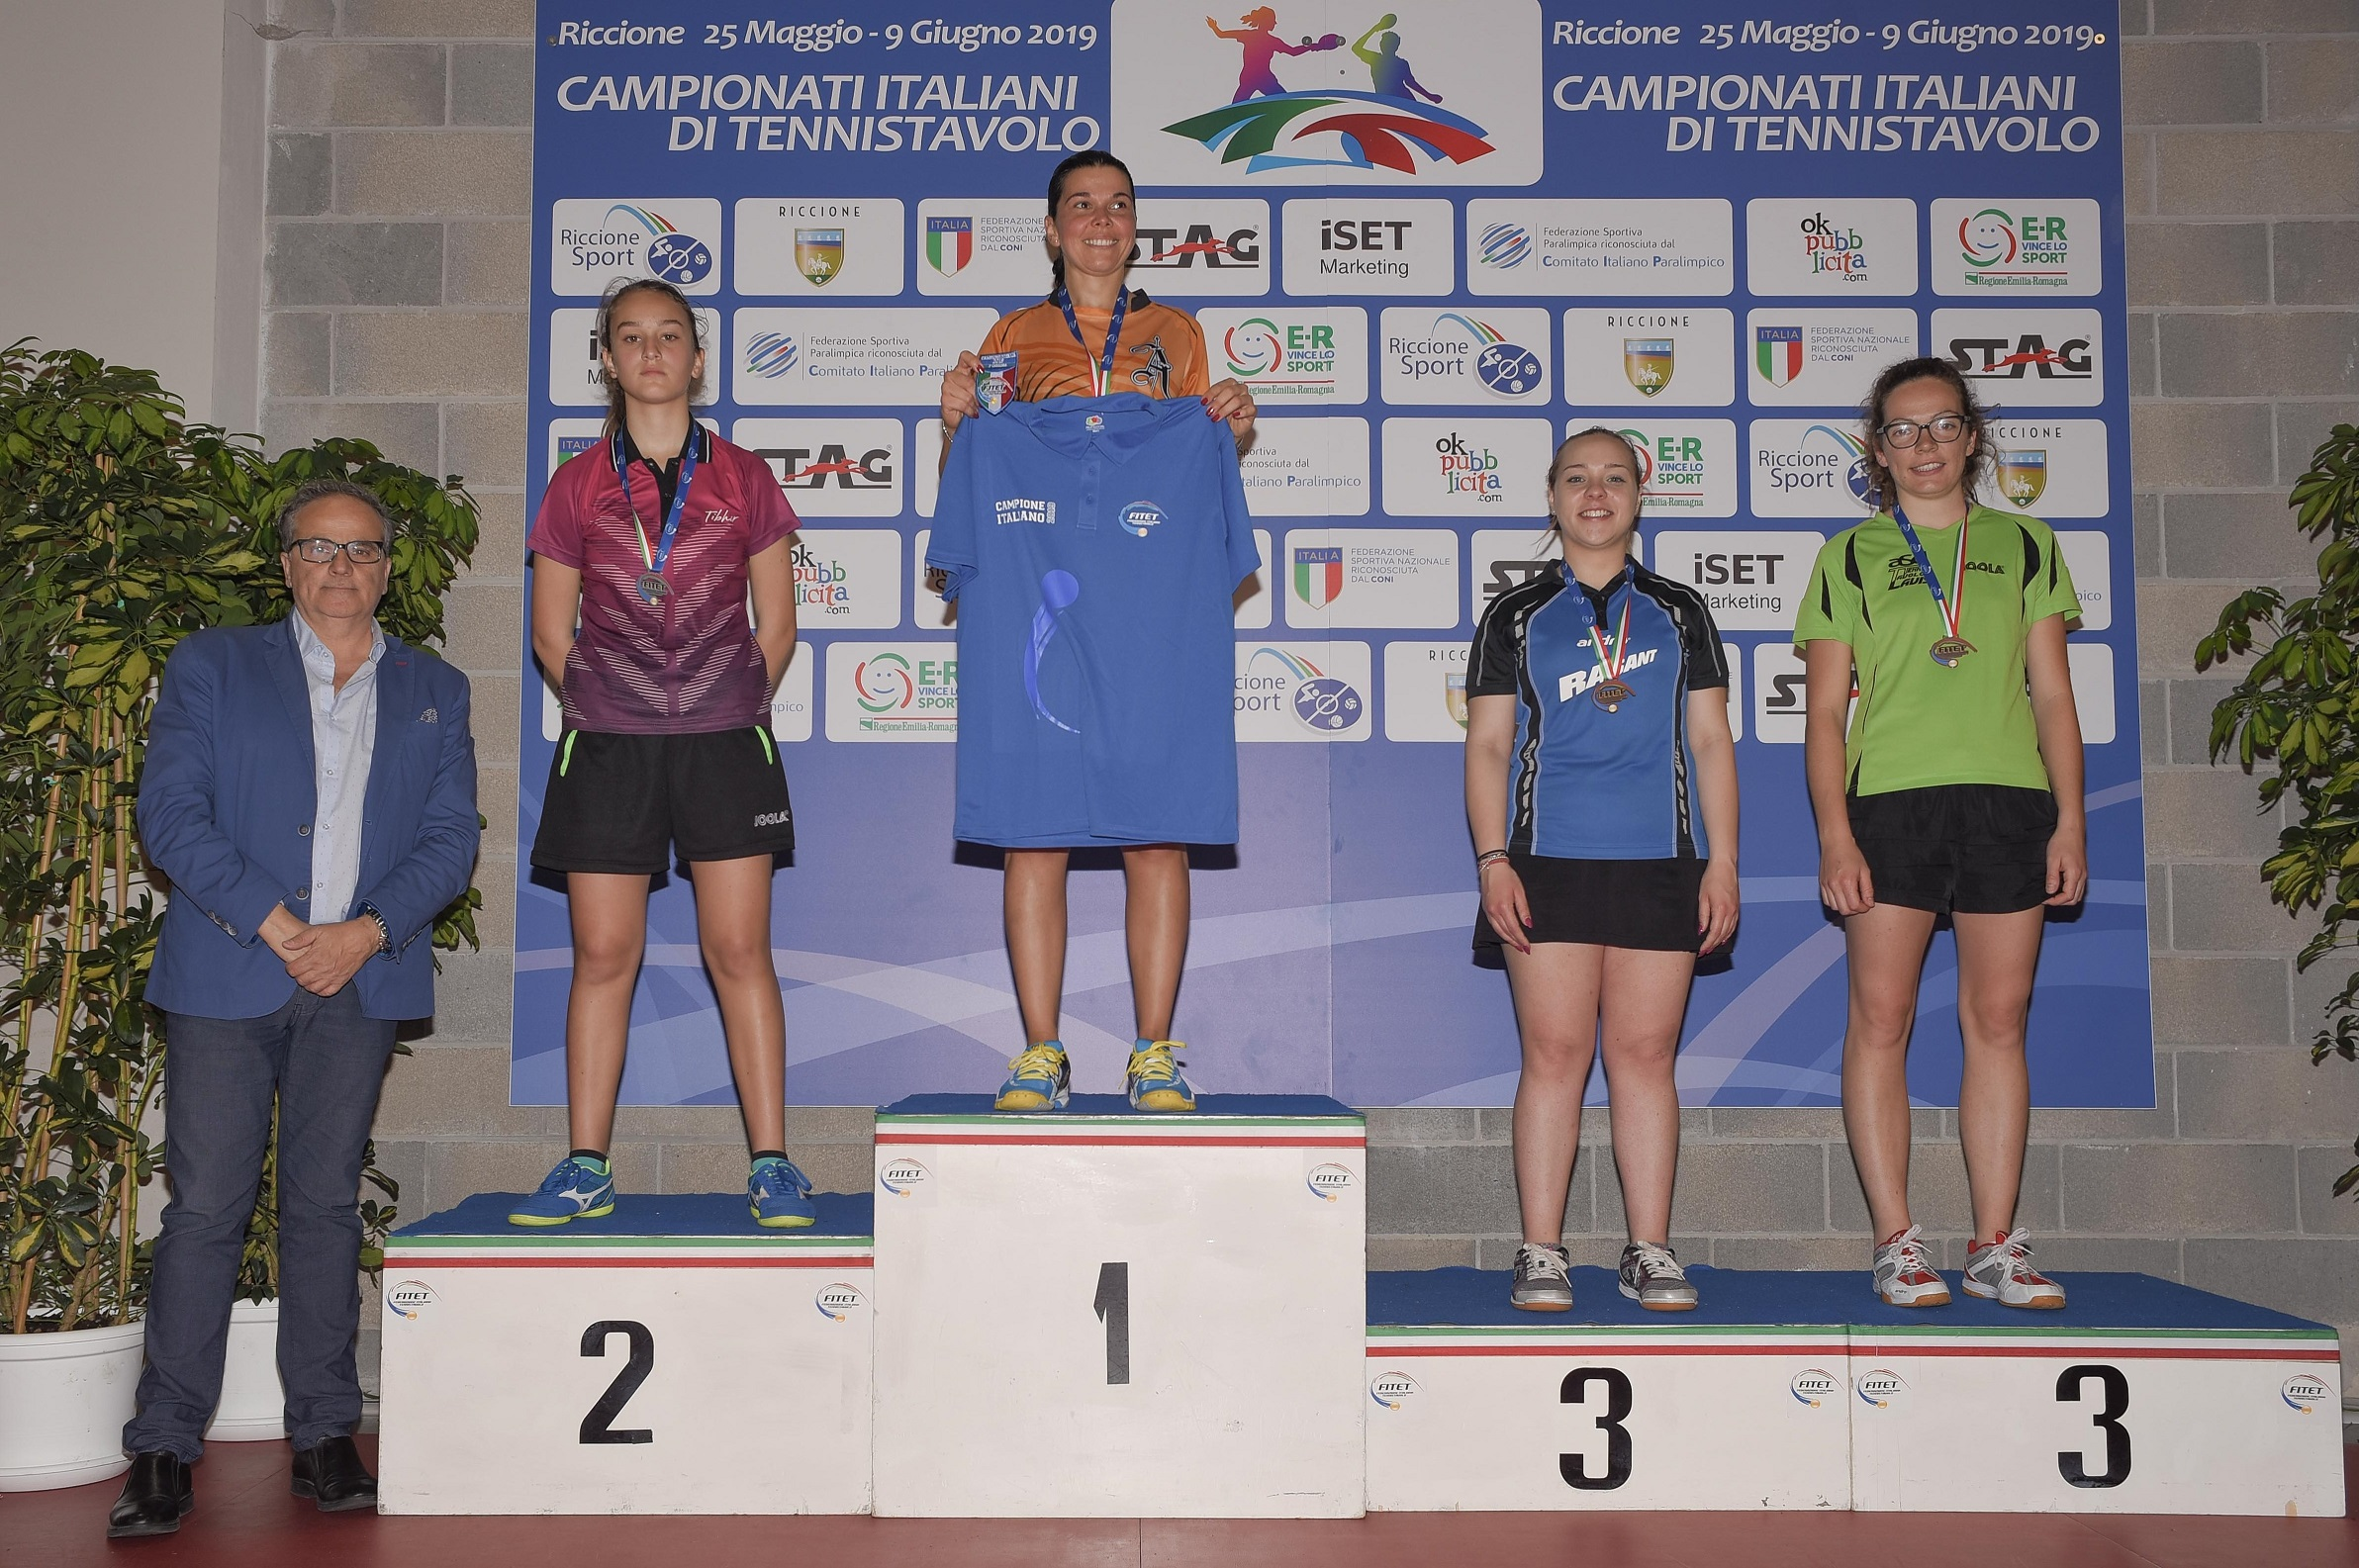 Tennistavolo, 13enne Carnovale sconfitta in finaleLa giovane vibonese si arrende solo con una 39enne